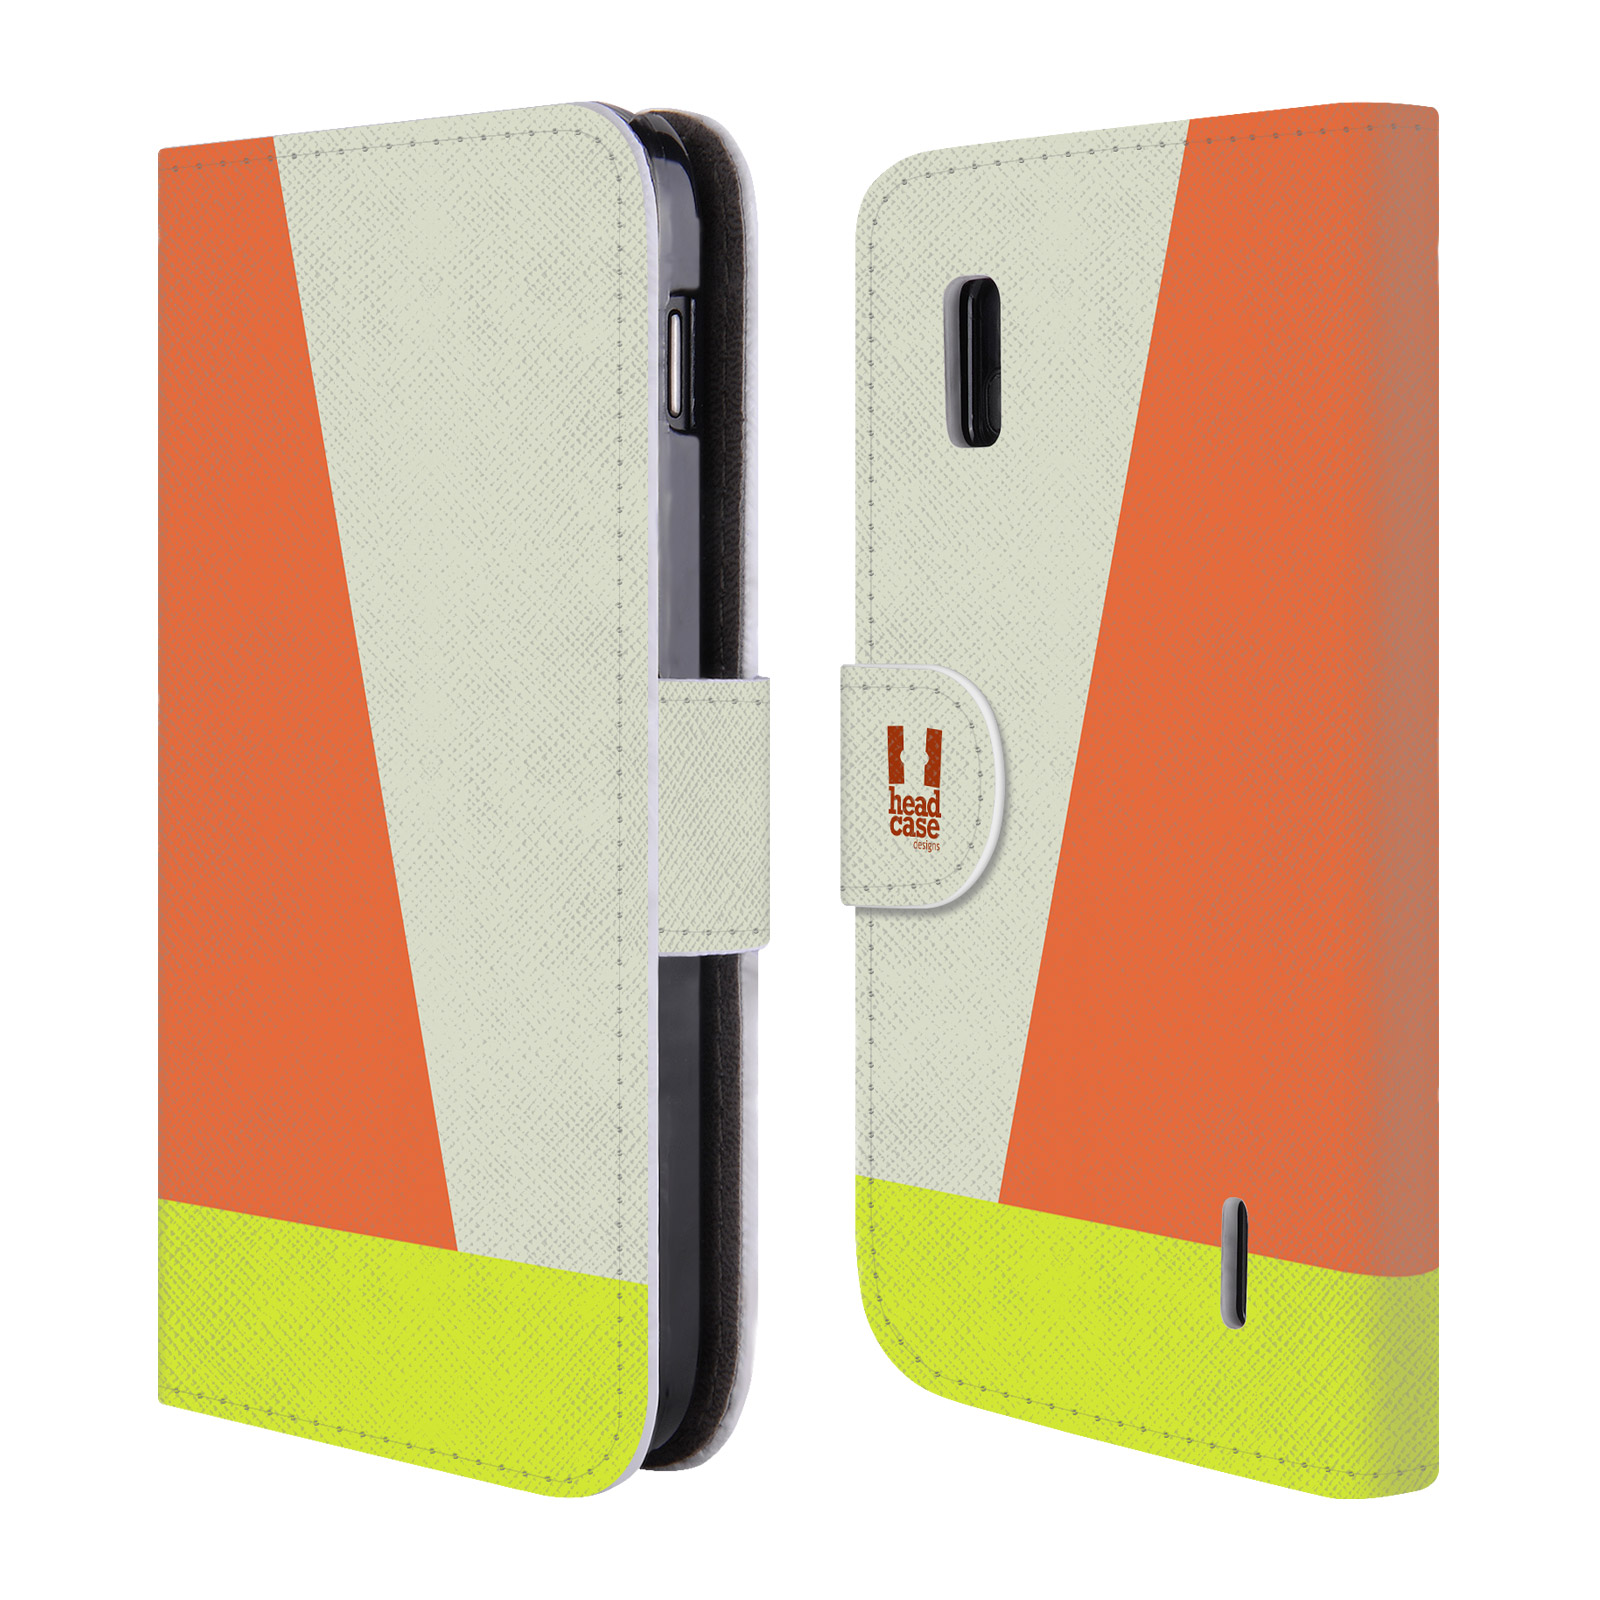 HEAD CASE Flipové pouzdro pro mobil LG NEXUS 4 barevné tvary slonová kost